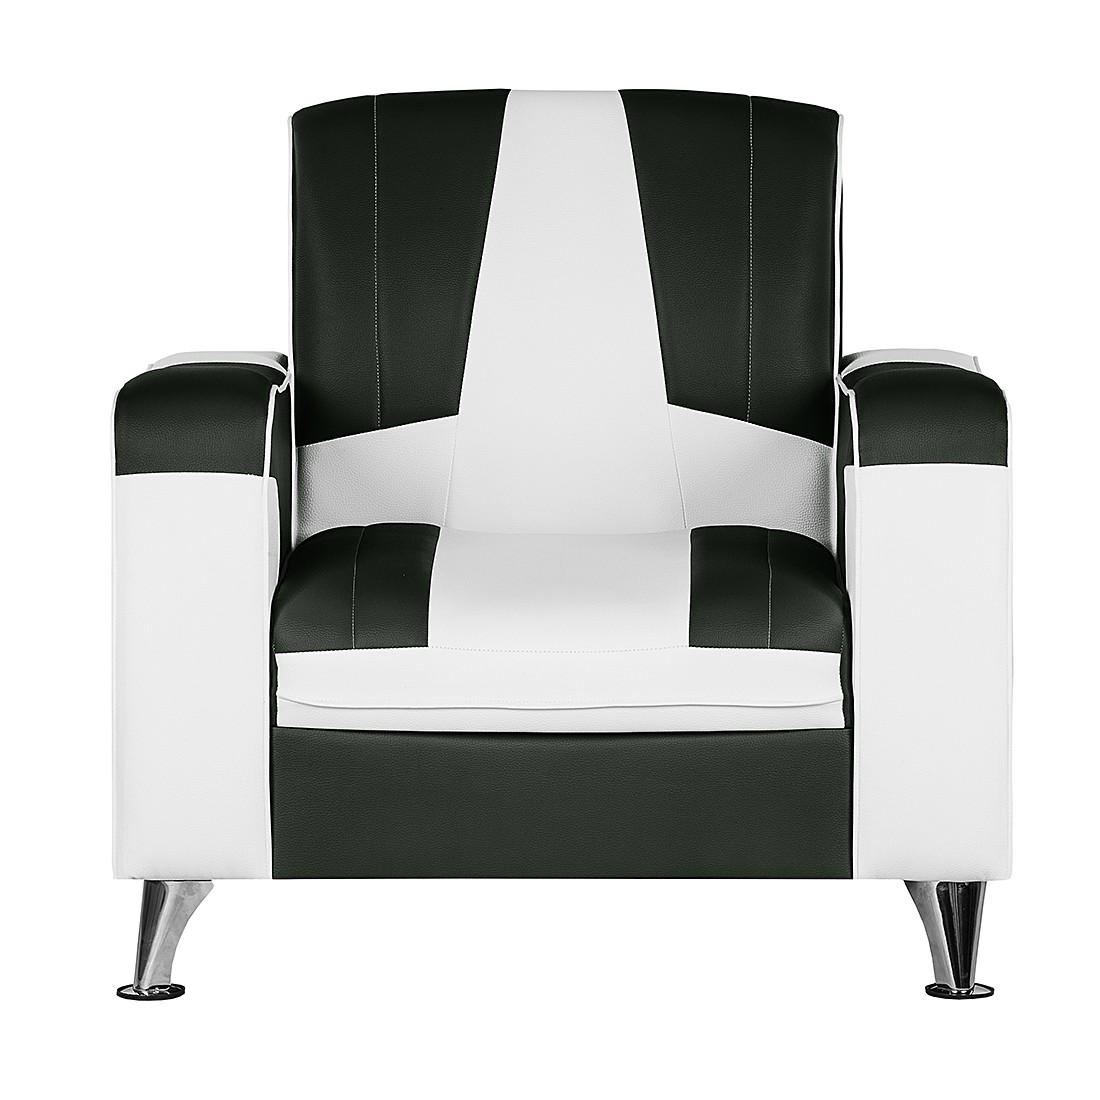 Home 24 - Fauteuil nixa - cuir synthétique - blanc / noir, studio monroe